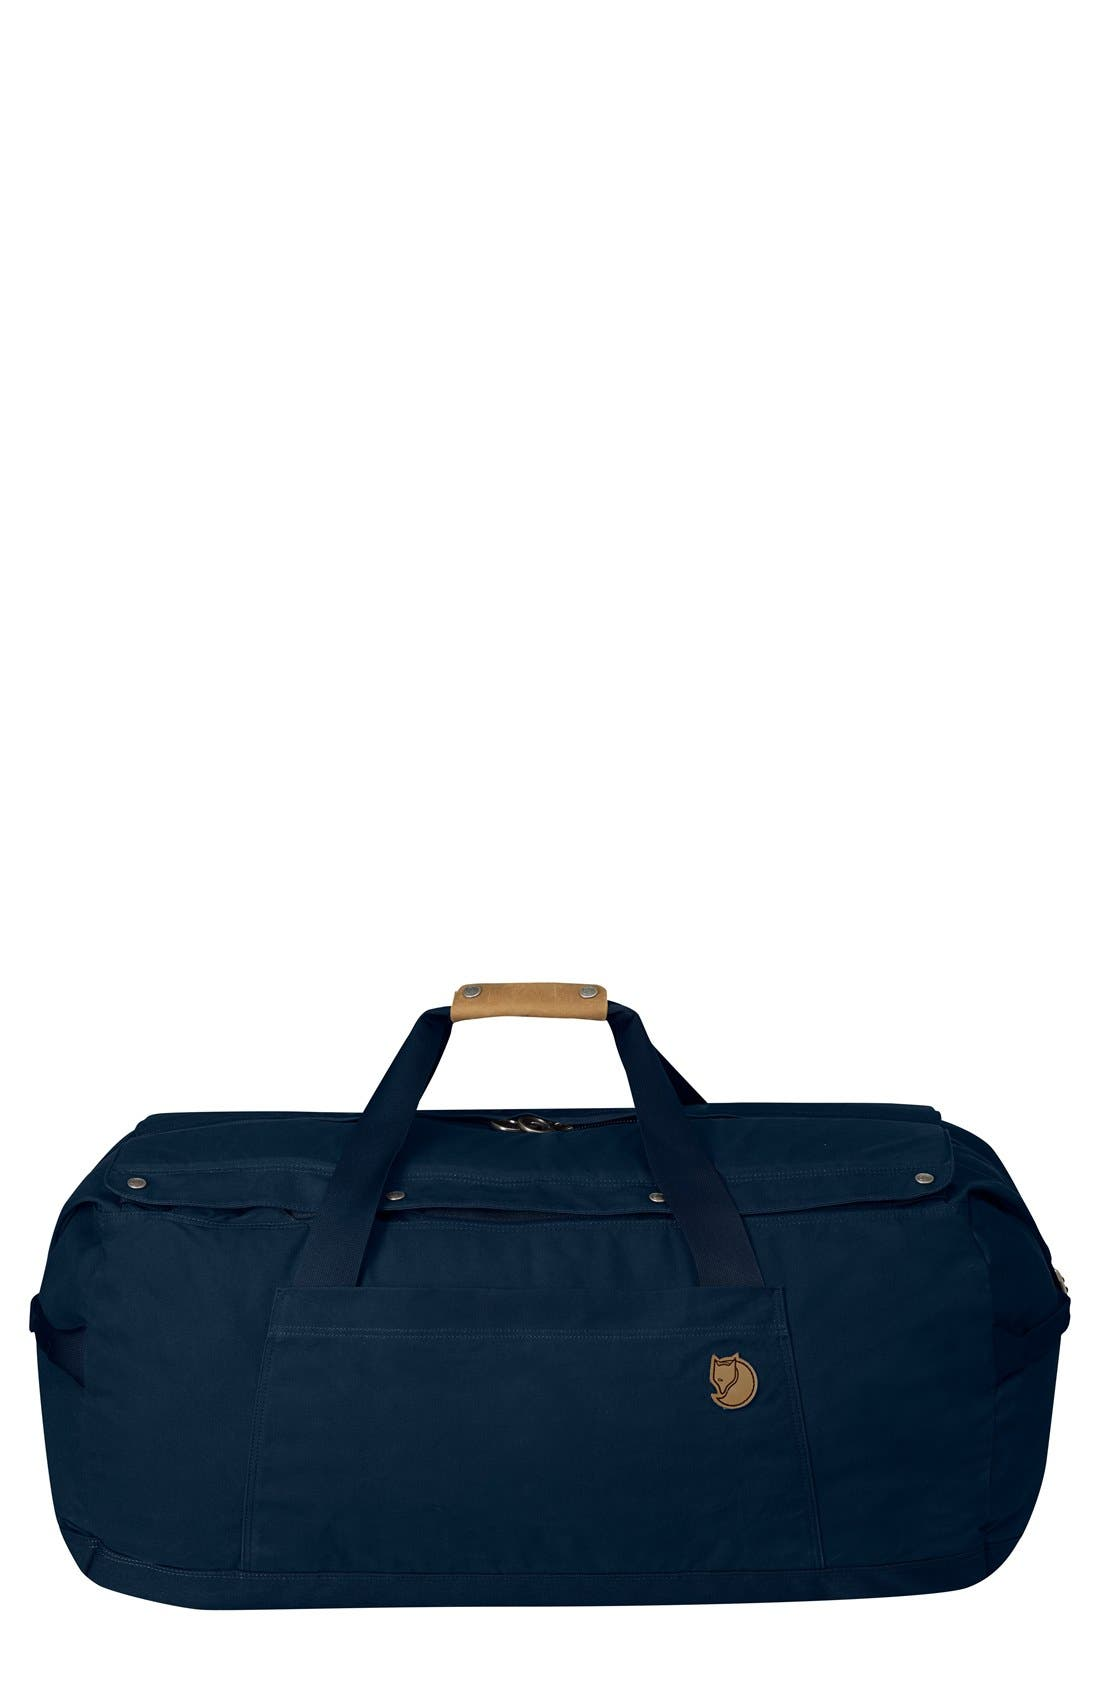 'Duffel Bag No. 6' Large Duffel Bag,                             Main thumbnail 4, color,